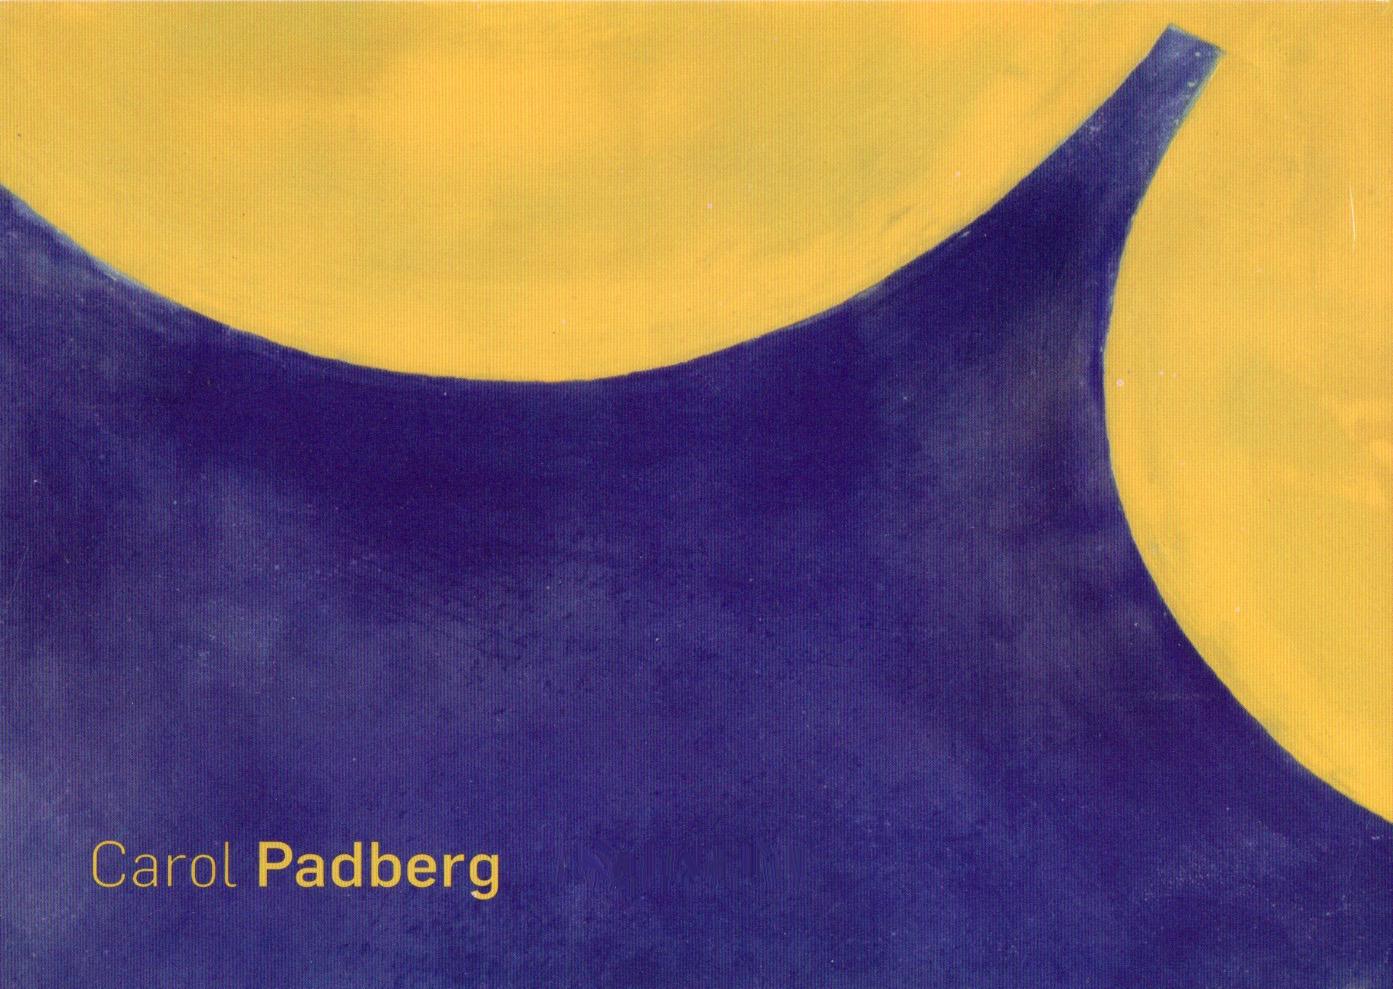 Carol Padberg_Fenn Gallery_Woodbury, CT_2005